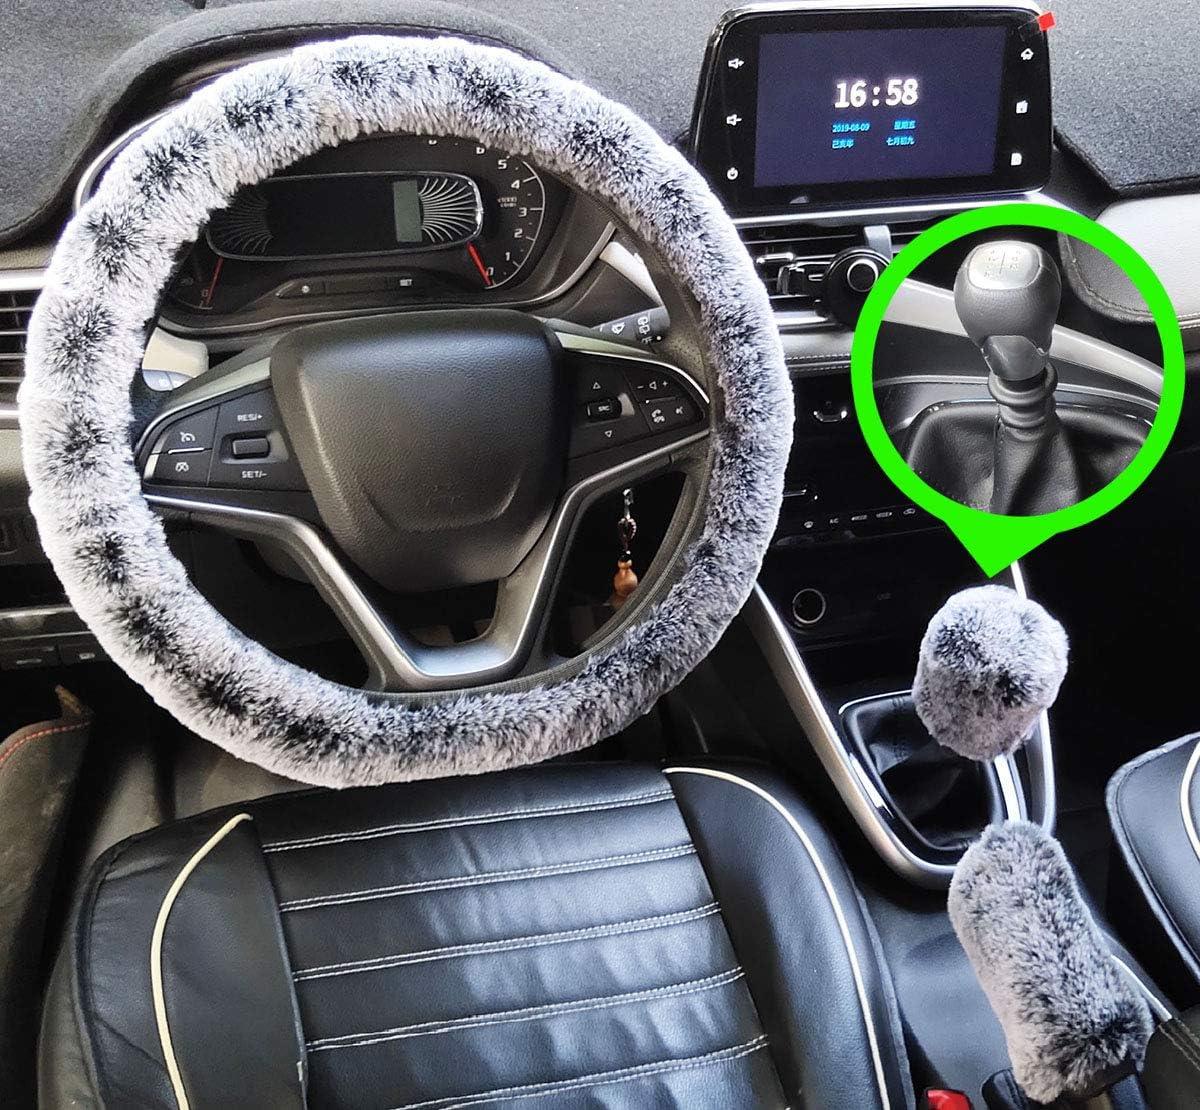 3Pcs Set Winter Fashion Faux Wool Steering Wheel Cover/&Handbrake Cover/&Gear Shift Cover Set Universal Furry Warm Plush car Interior Manual, rainbow